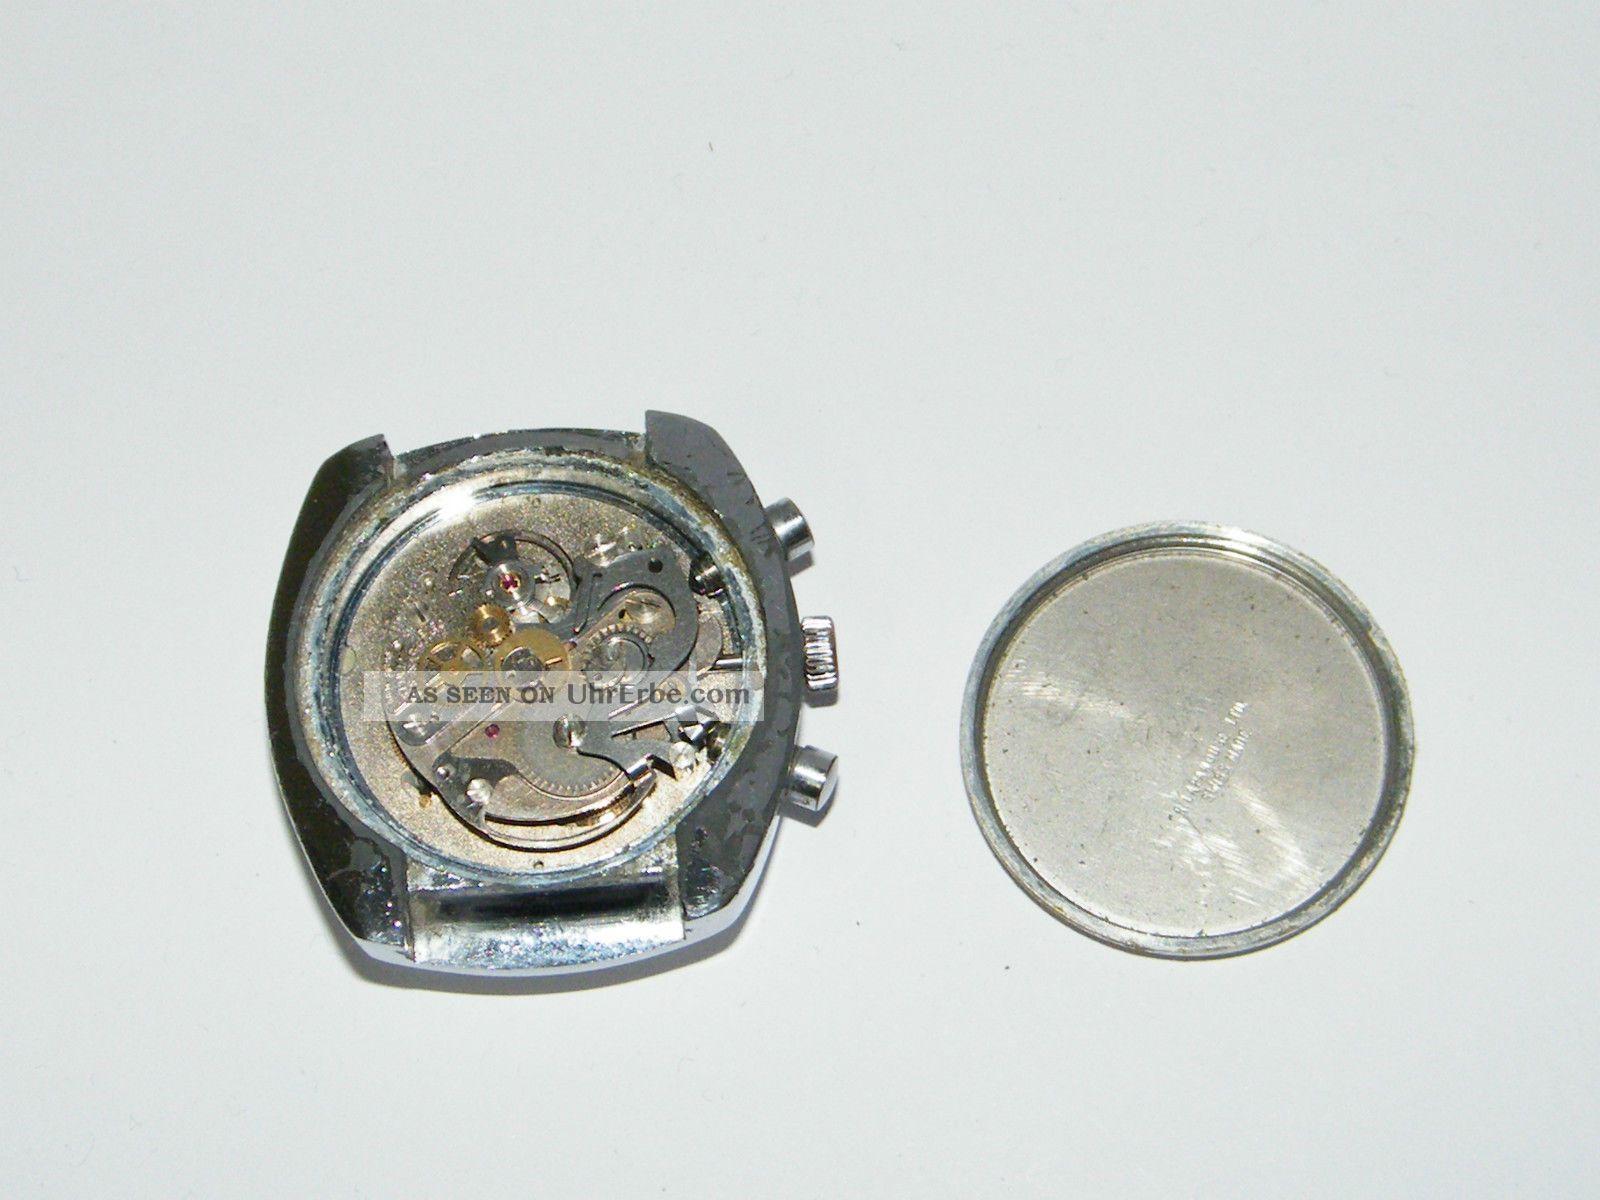 Cimier Chronograph Vintage Handaufzug, Wrist Watch, Repair